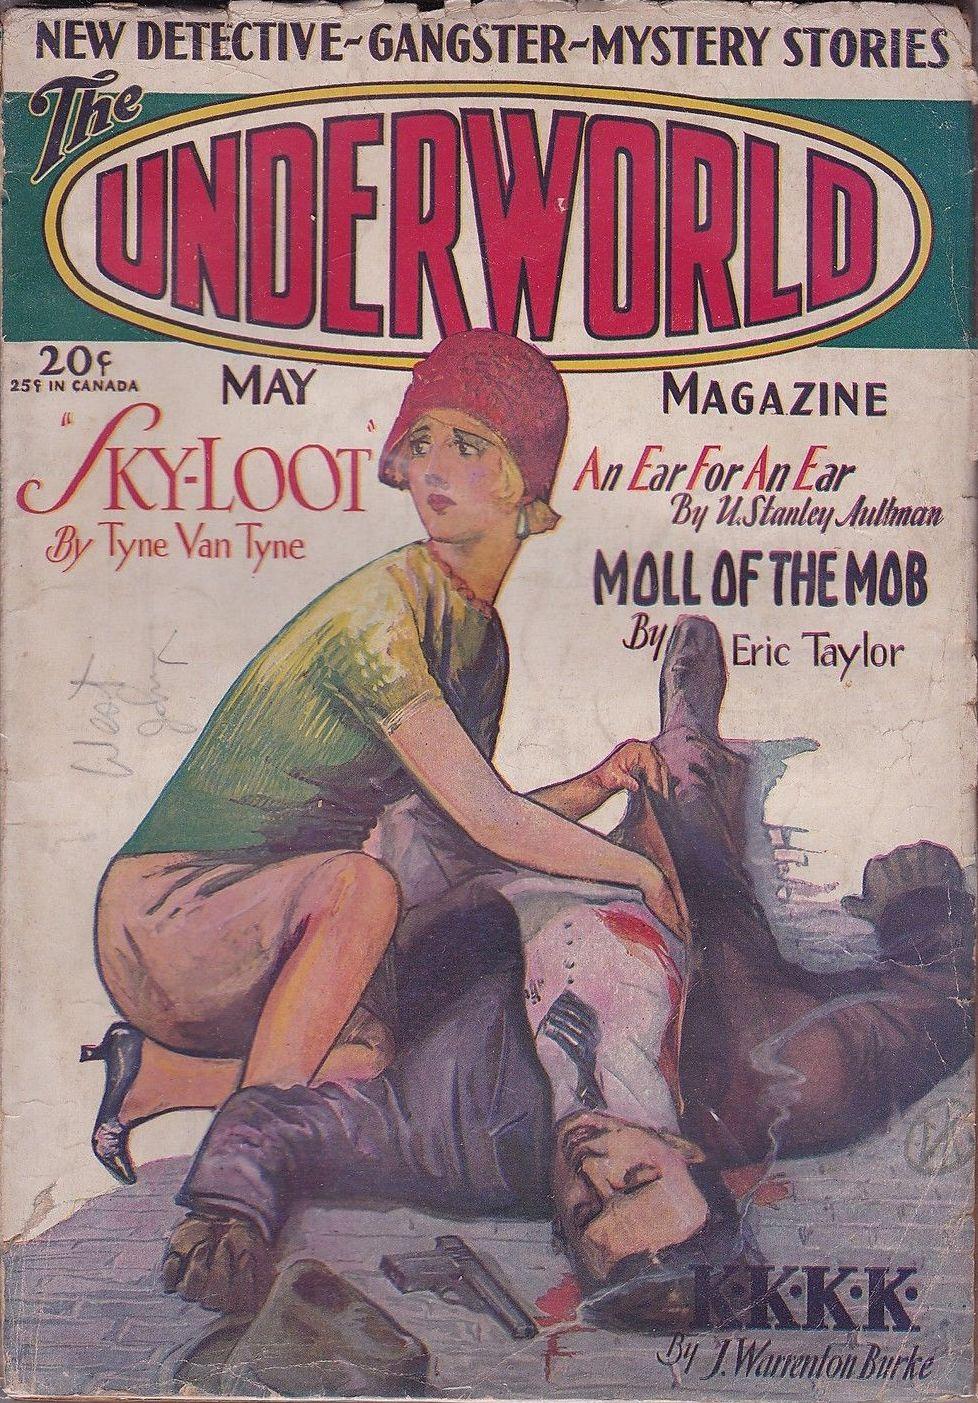 https://pulpcovers.com/wp-content/uploads/2017/07/The-Underworld-Magazine-May-1930.jpg